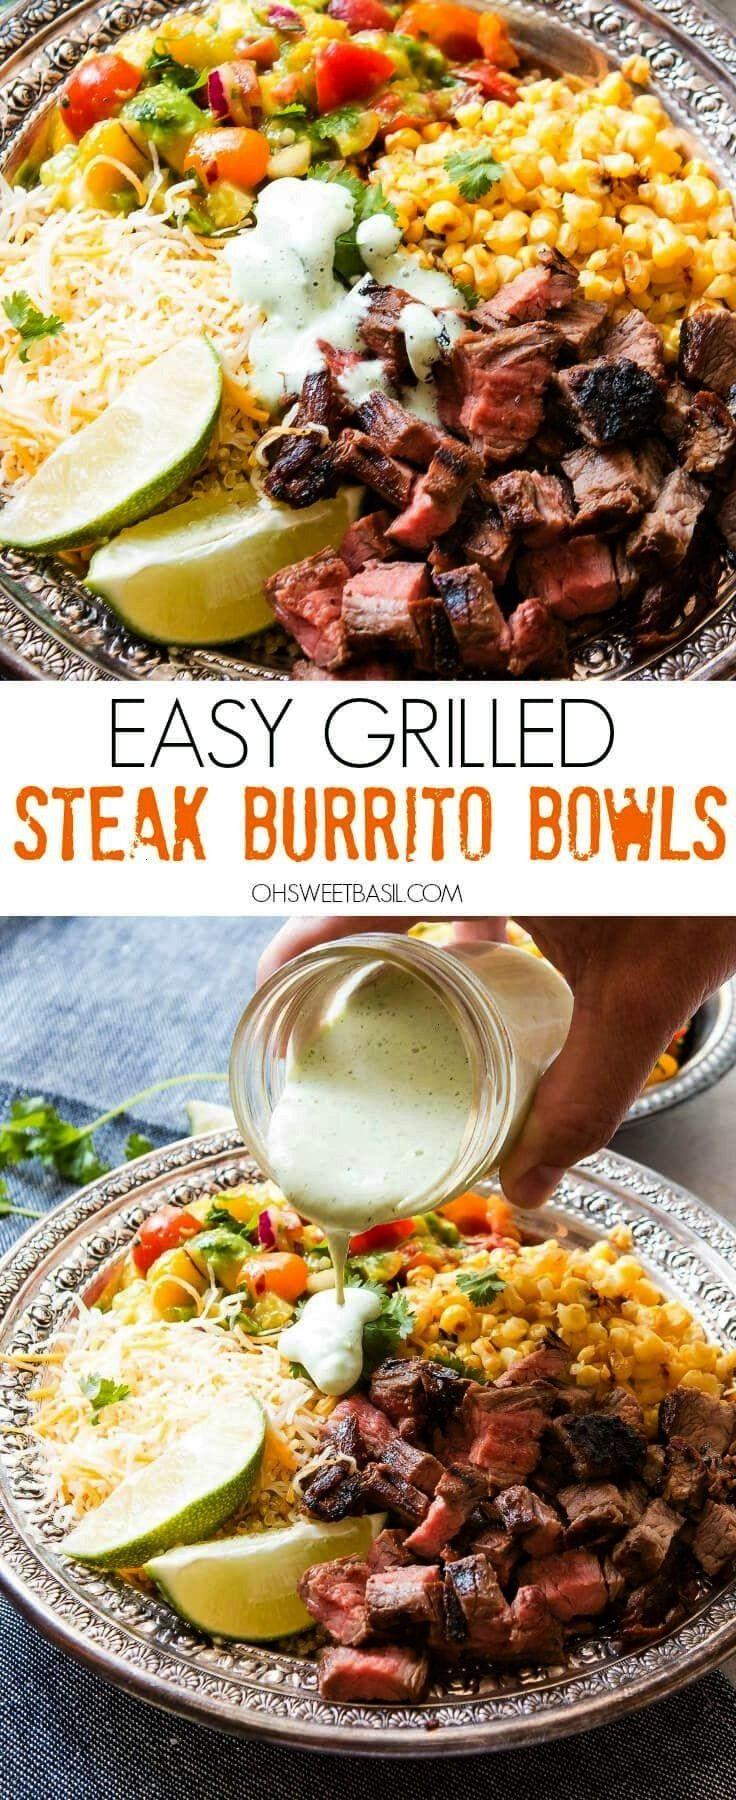 Grilled Steak Burrito Bowls - Oh Sweet Basil -  Easy Grilled Steak Burrito Bowls are great for easy